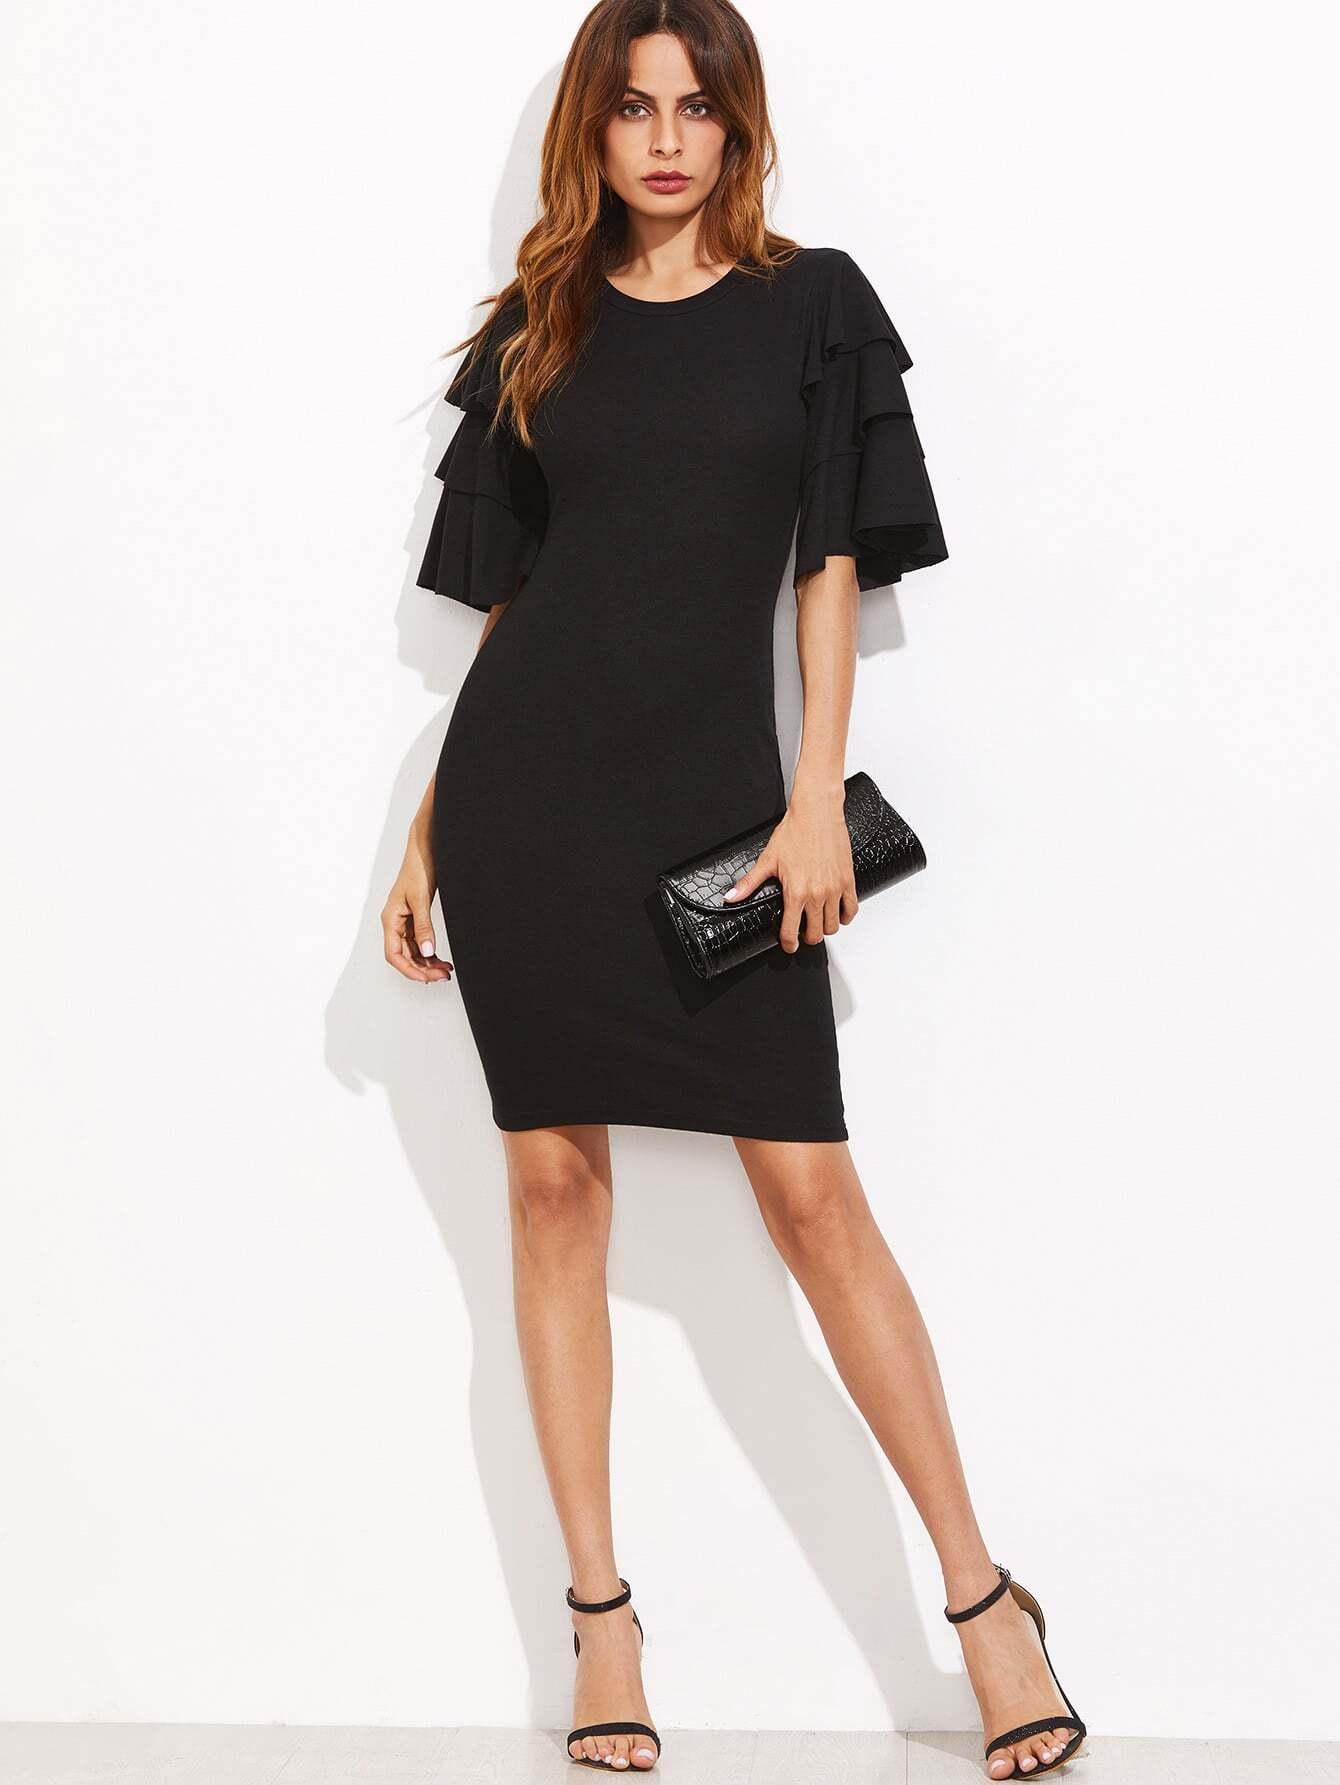 Layered Ruffle Sleeve Ribbed Dress dress161026717